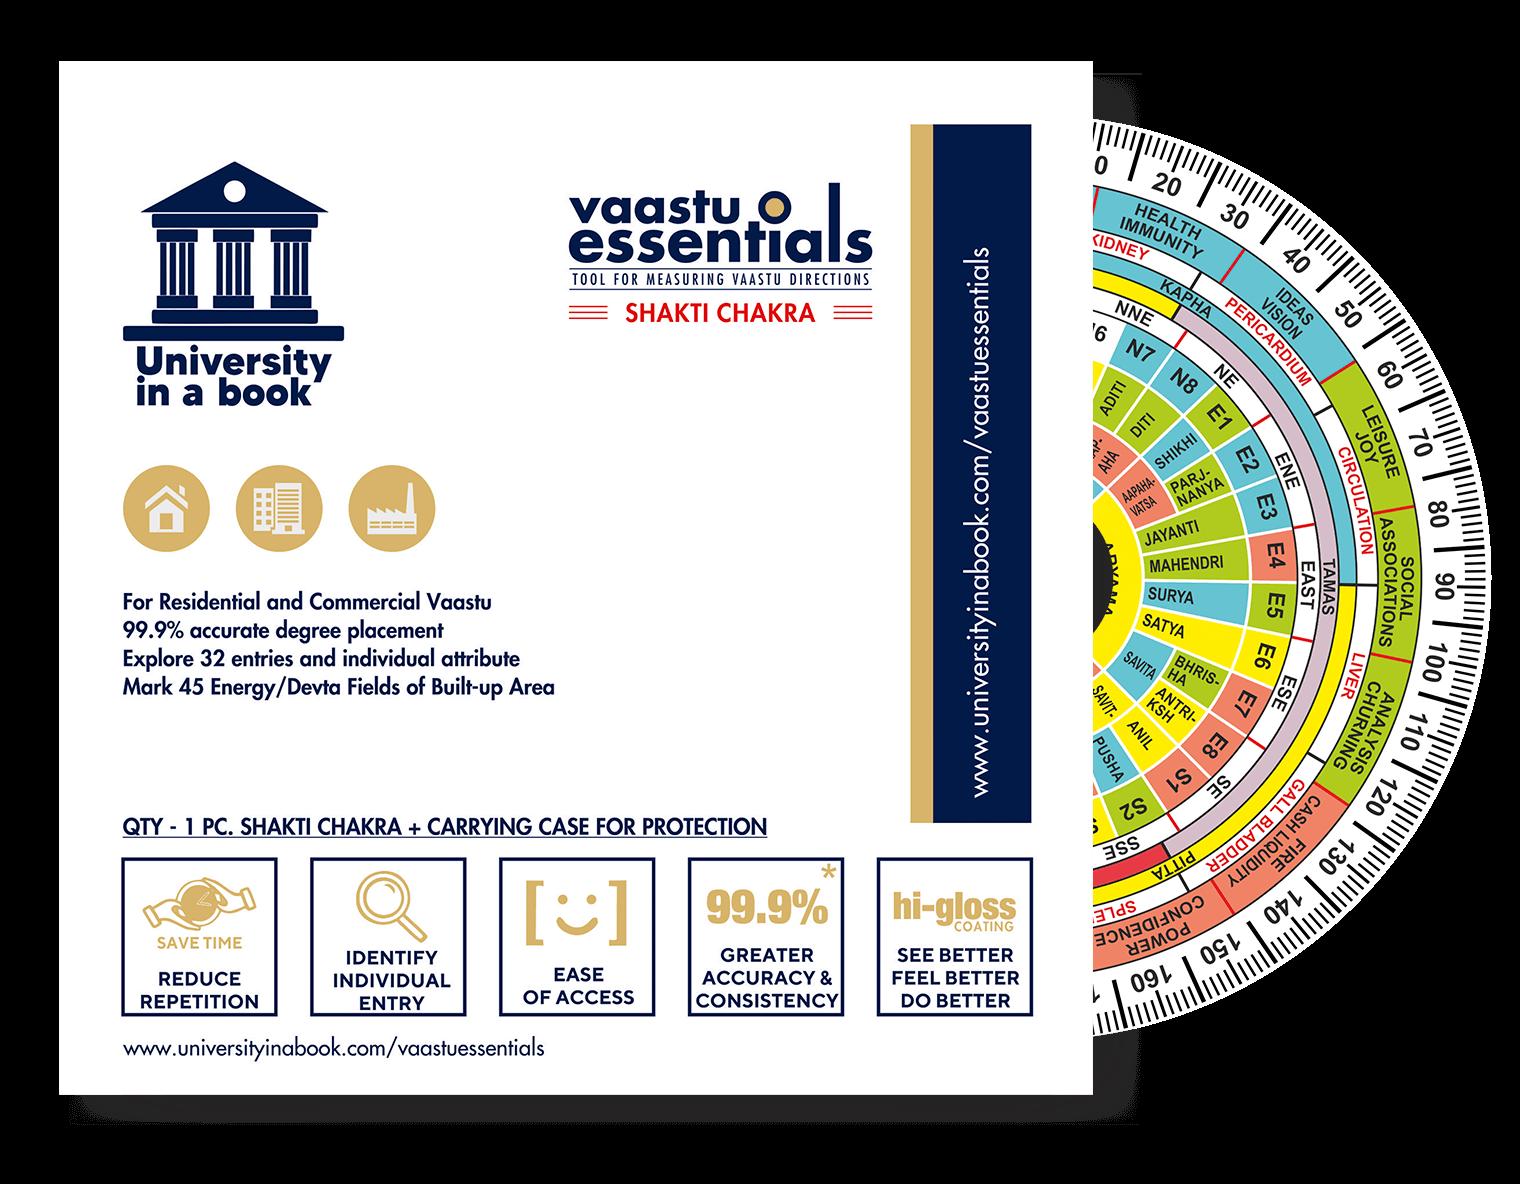 Vaastu Essentials Shakti Chakra